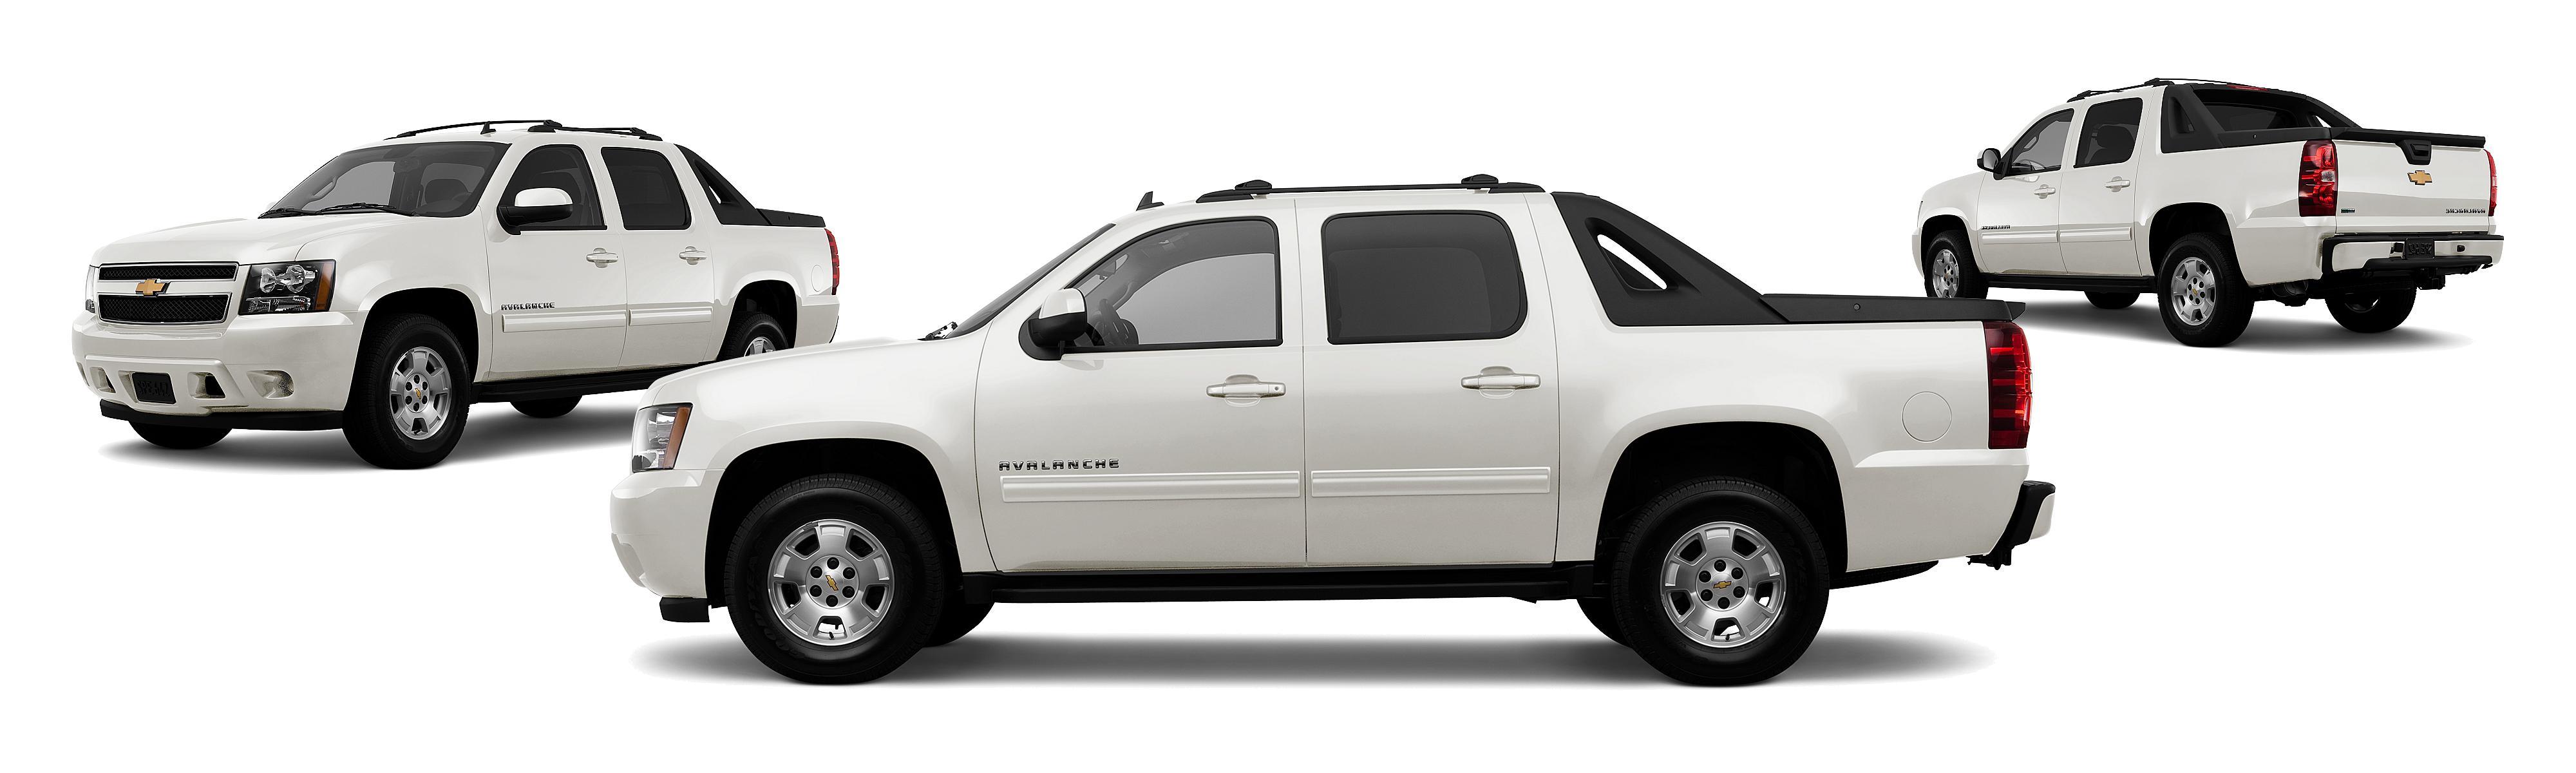 ltz groovecar chevrolet pickup research metallic avalanche ls blue crew imperial large composite cab